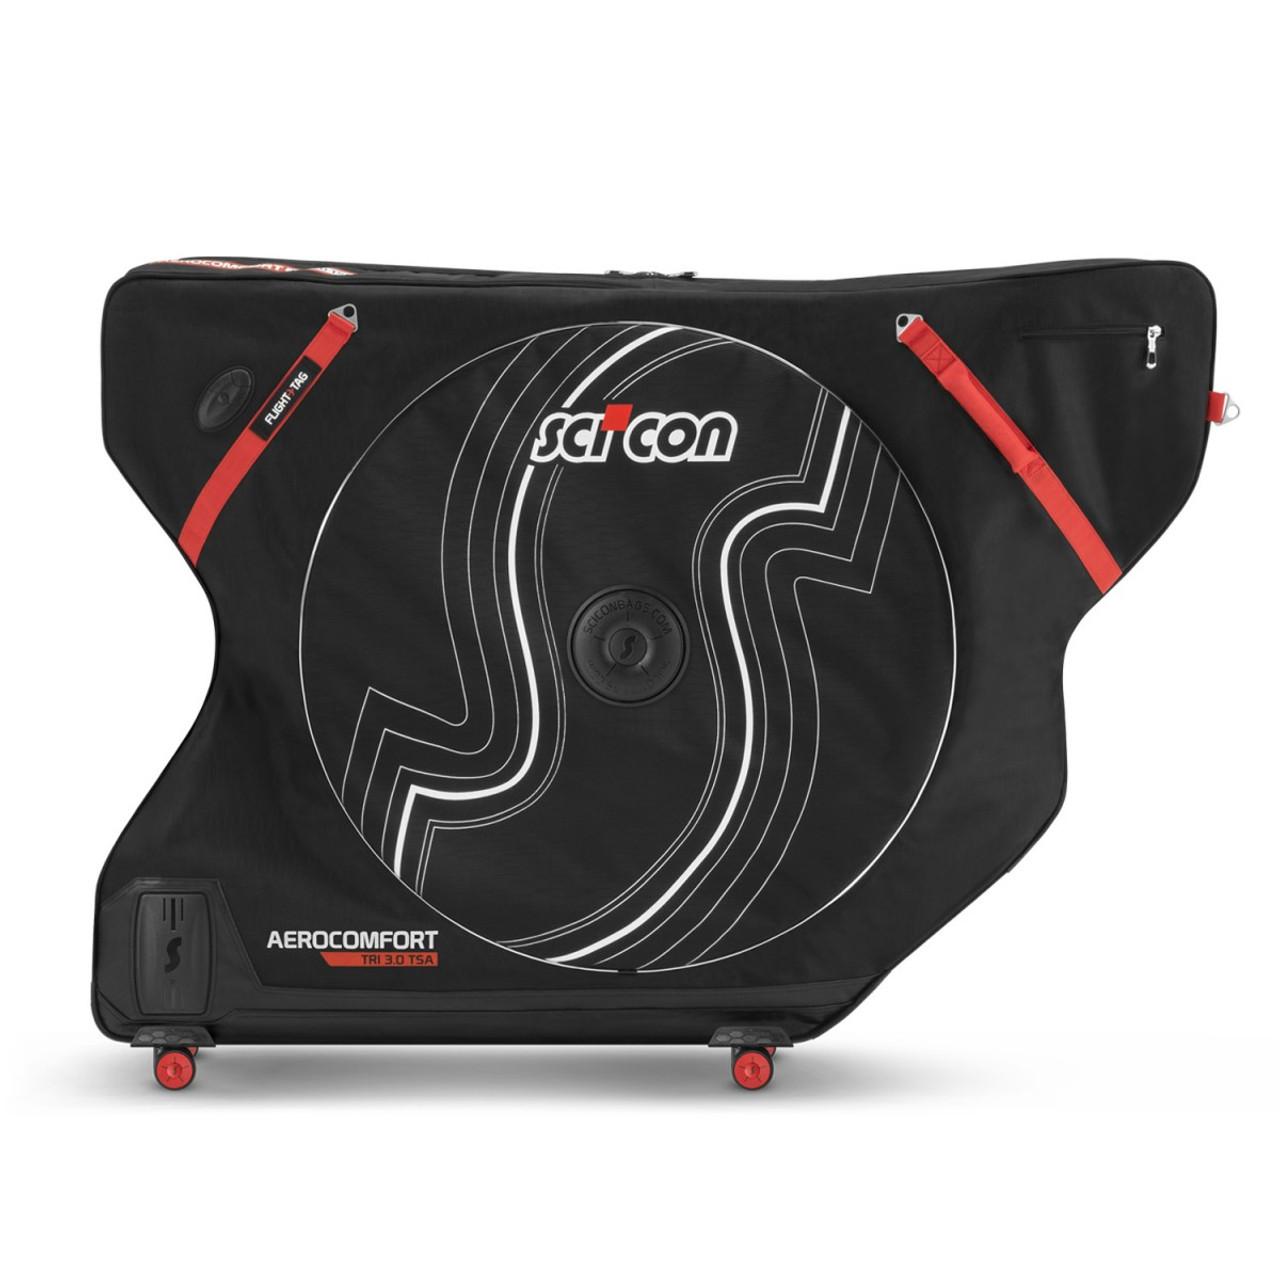 9eeb68a96df3 Aerocomfort 3.0 Triathlon Bike Travel Bag | SciCon | TSA Rolling Case